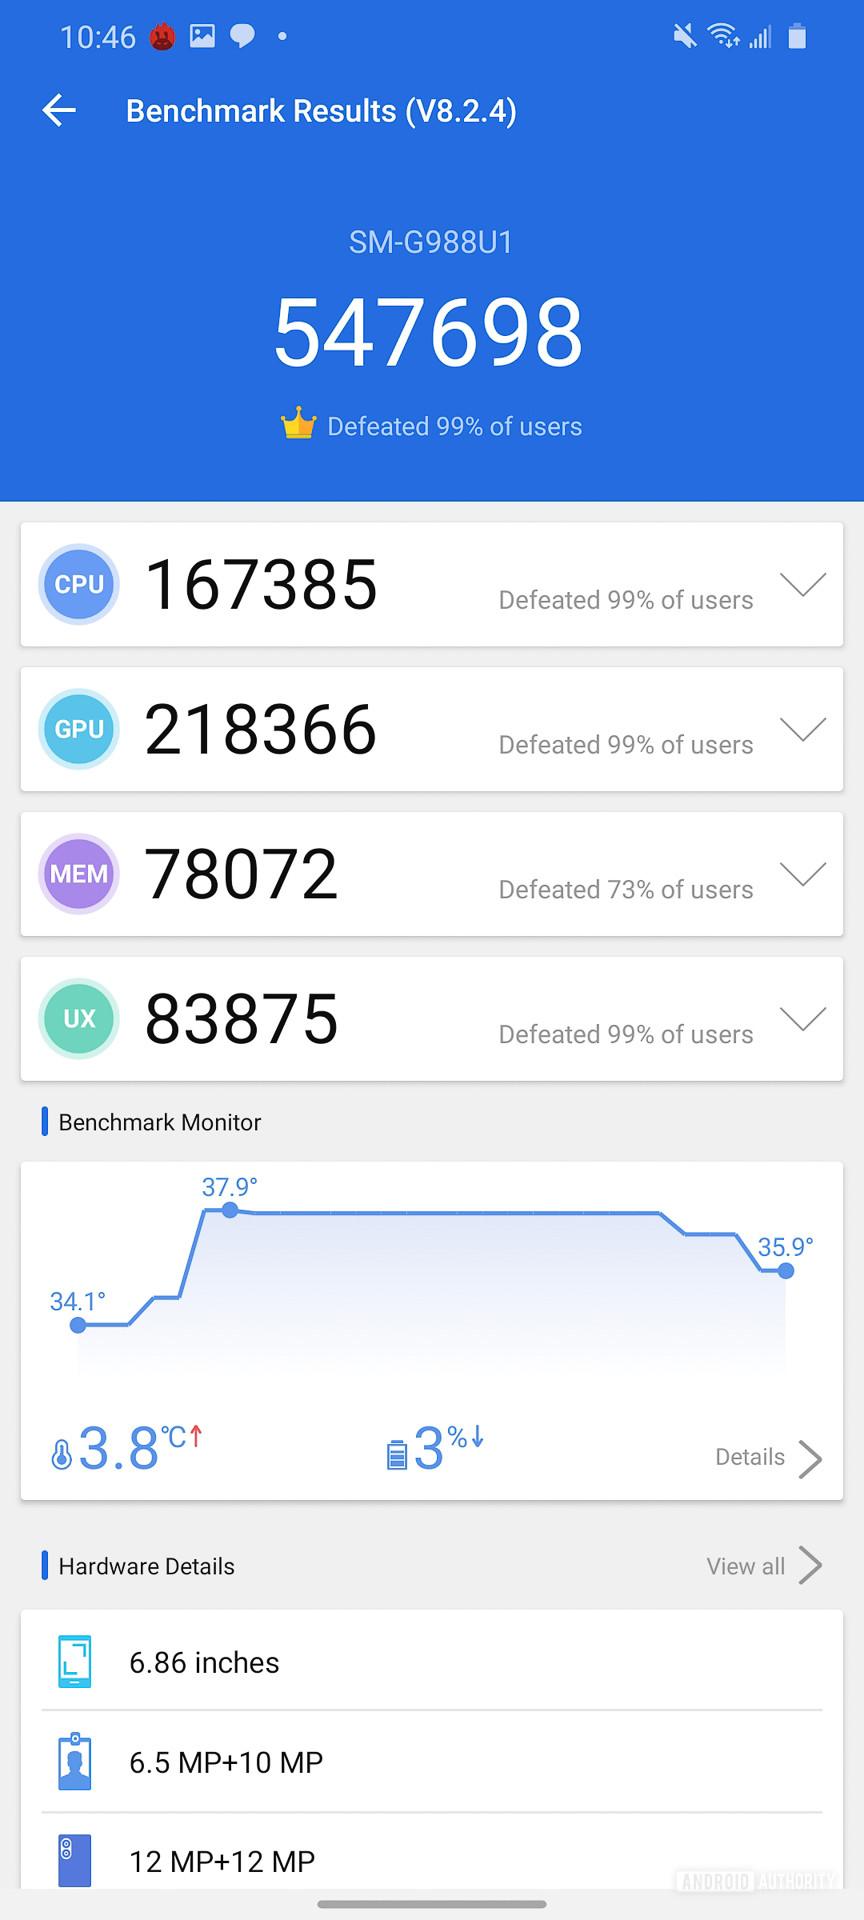 Samsung Galaxy S20 Ultra AnTuTu